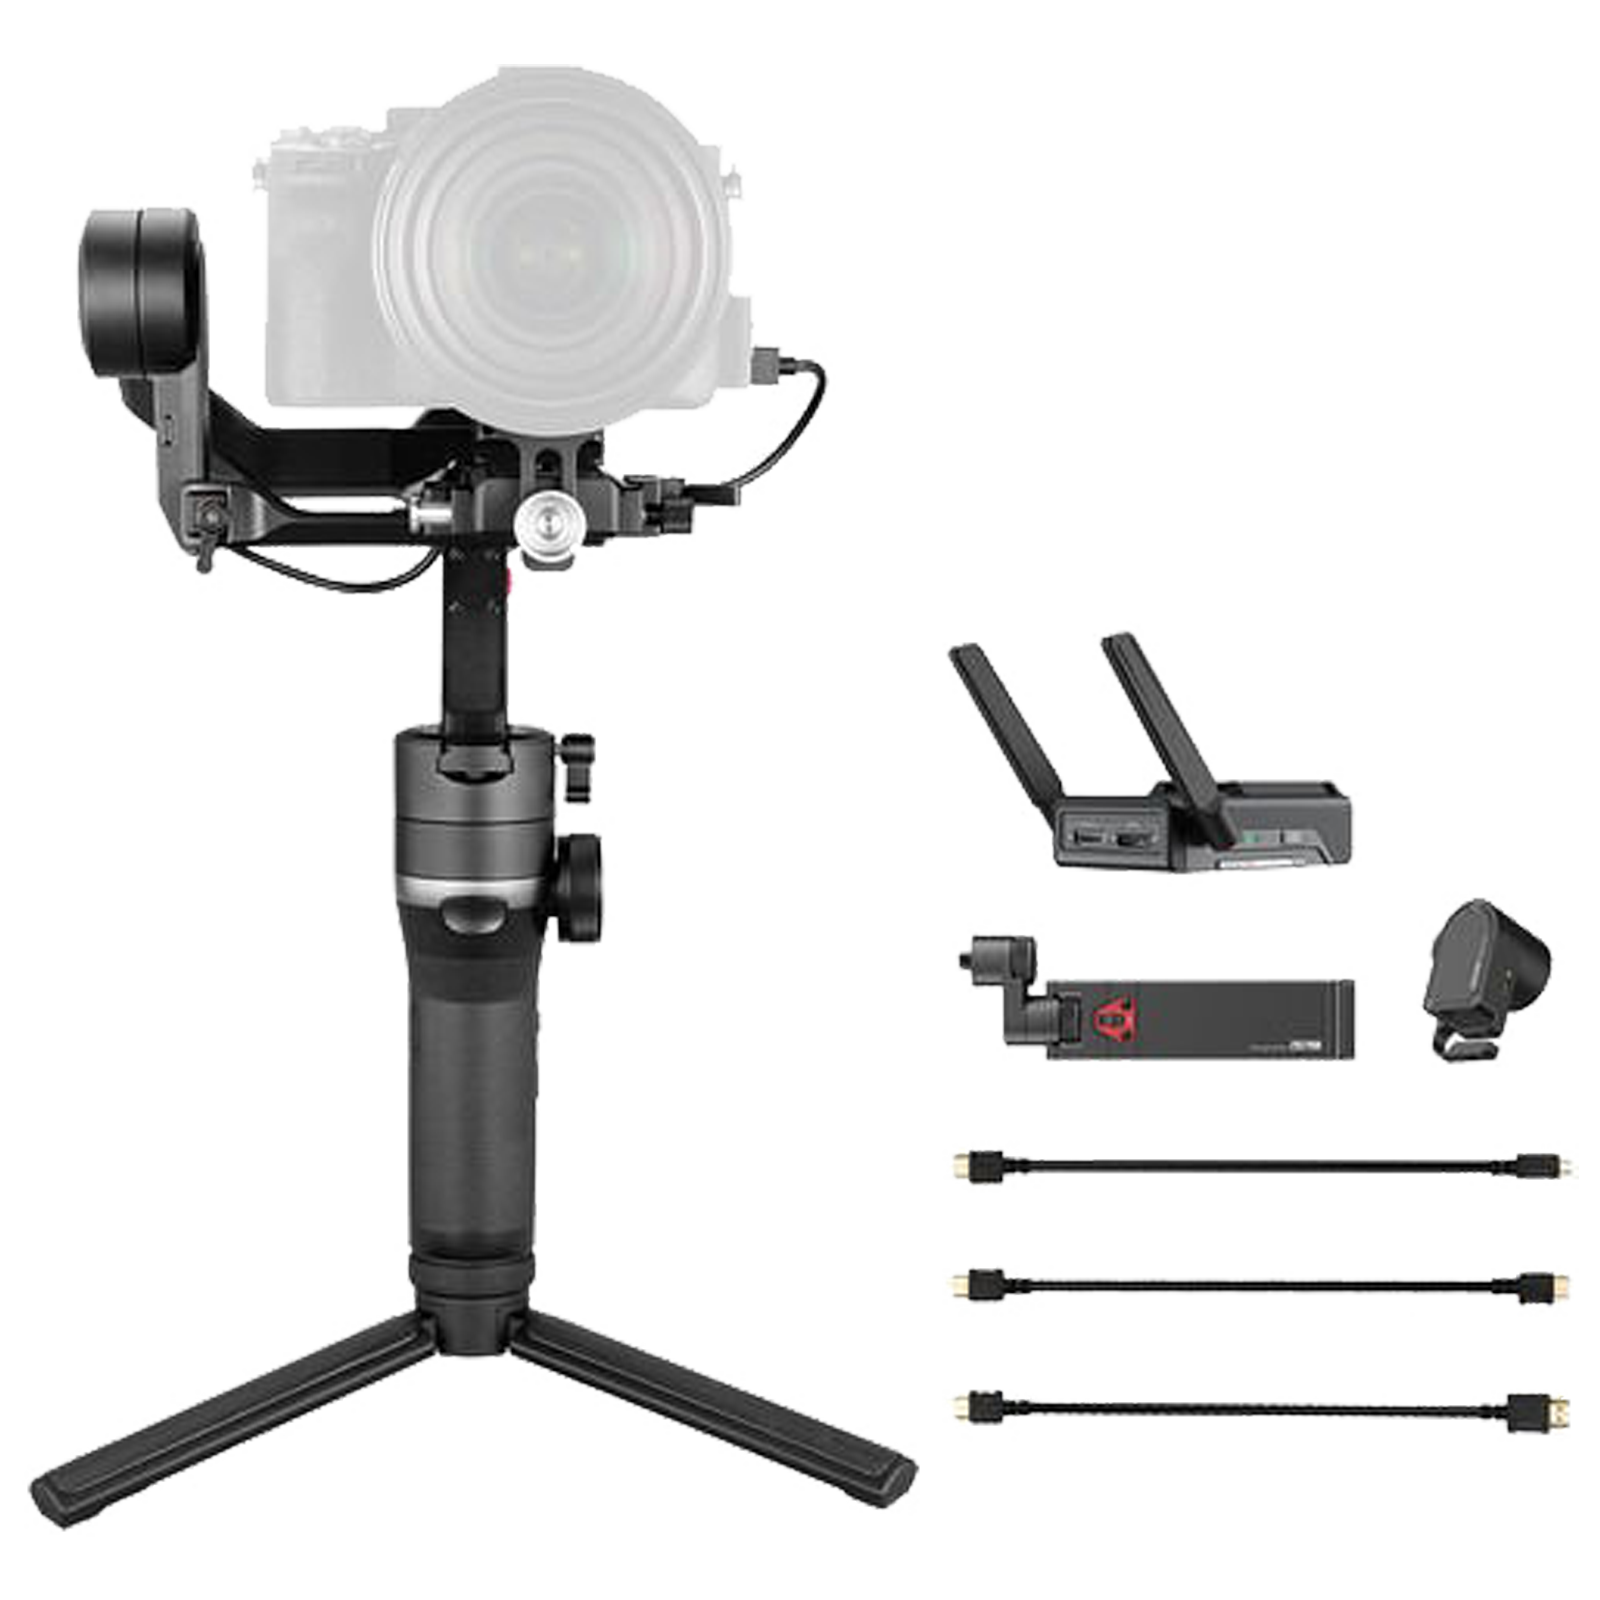 Zhiyun Weebill-S Image Transmission Pro Gimbal For DSLR Camera and Mirrorless Camera (Six Modes of Operation, ZH.00000006.03, Black)_1